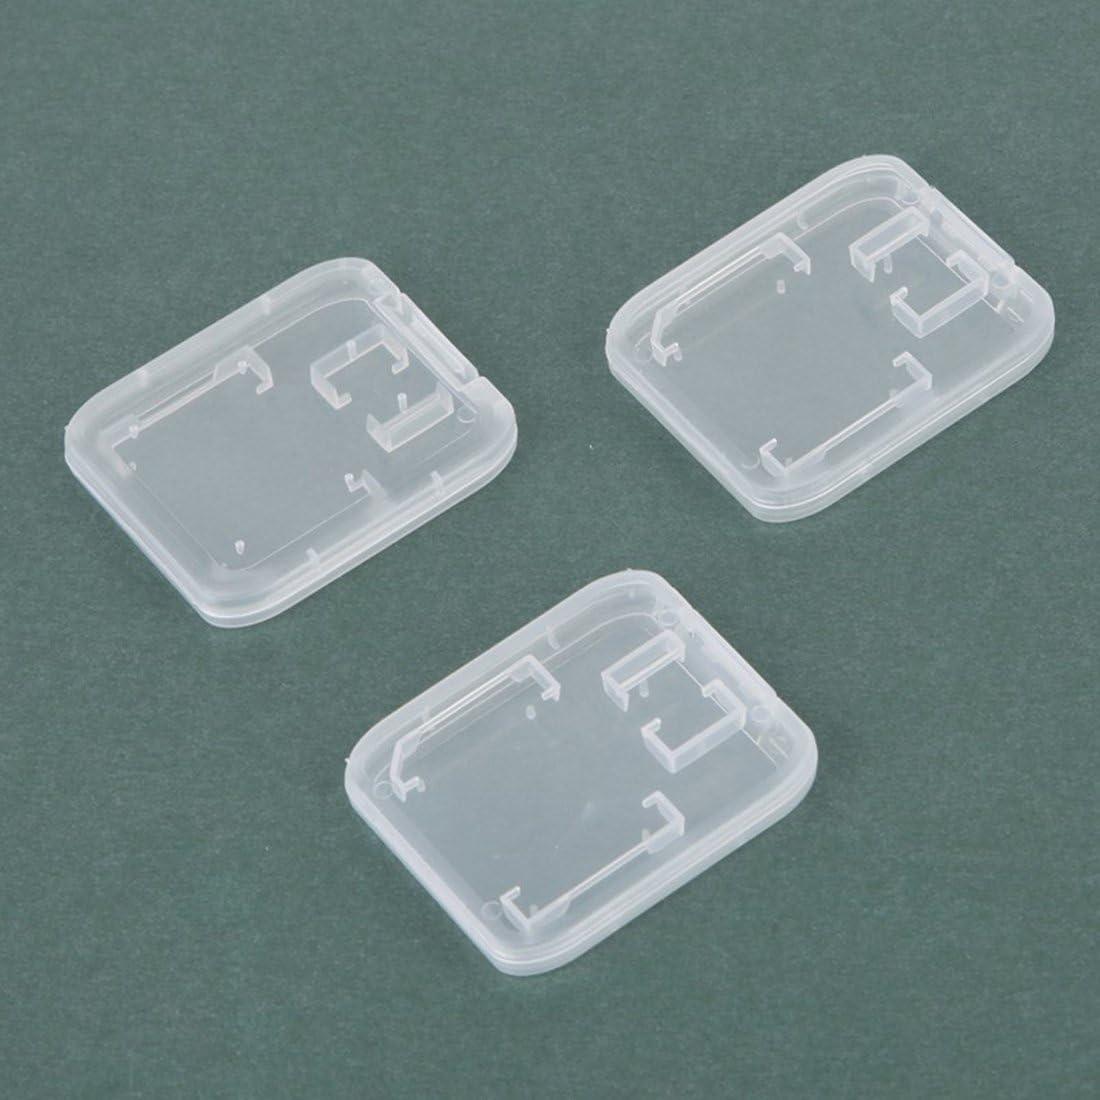 10Pcs Transparent Standard SD Sdhc Speicherkarte Fall Halter Box Carry Speicher